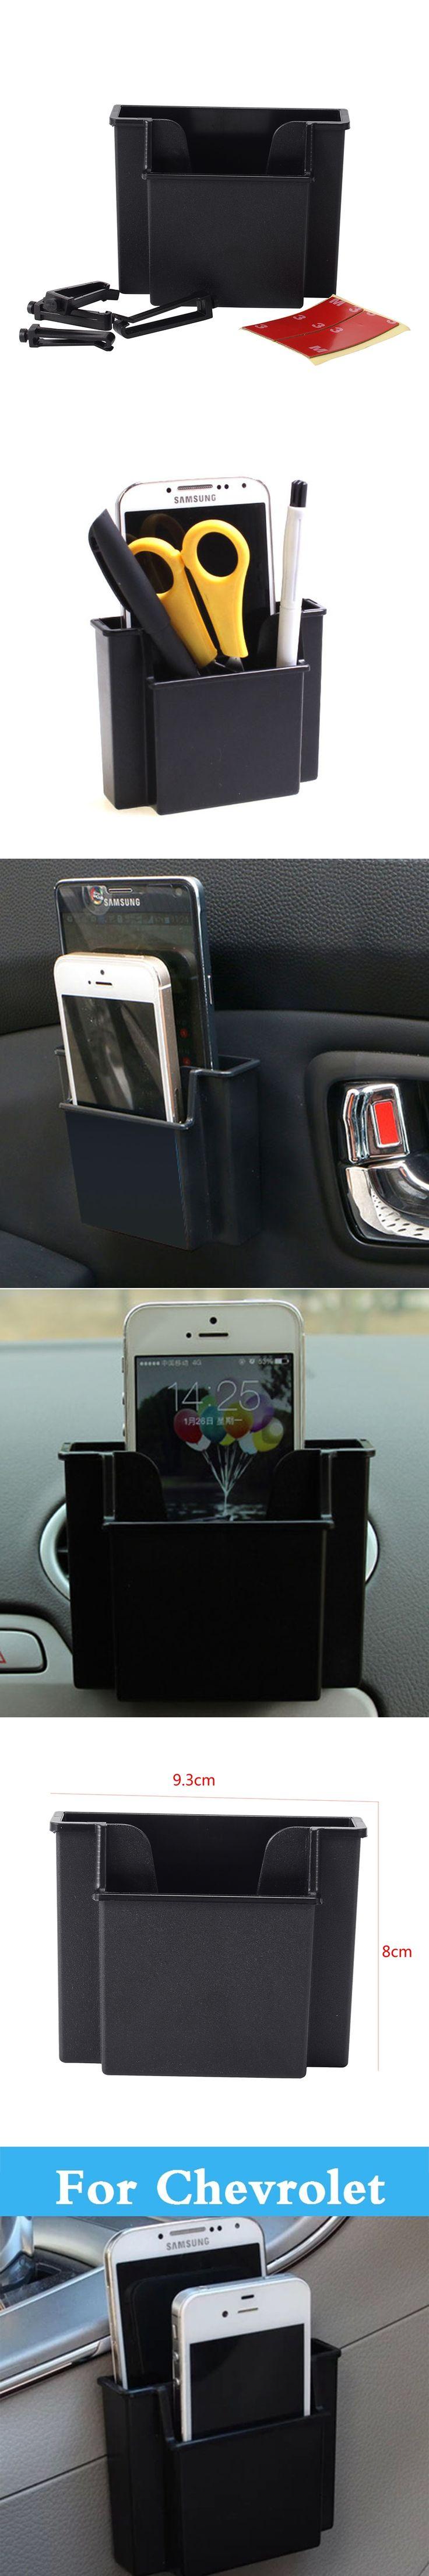 Car Cell Phone  Holder Storage Box Holder Orangizer For Chevrolet Corvette Cruze Epica Impala Kalos Lacetti Equinox Evanda Hhr